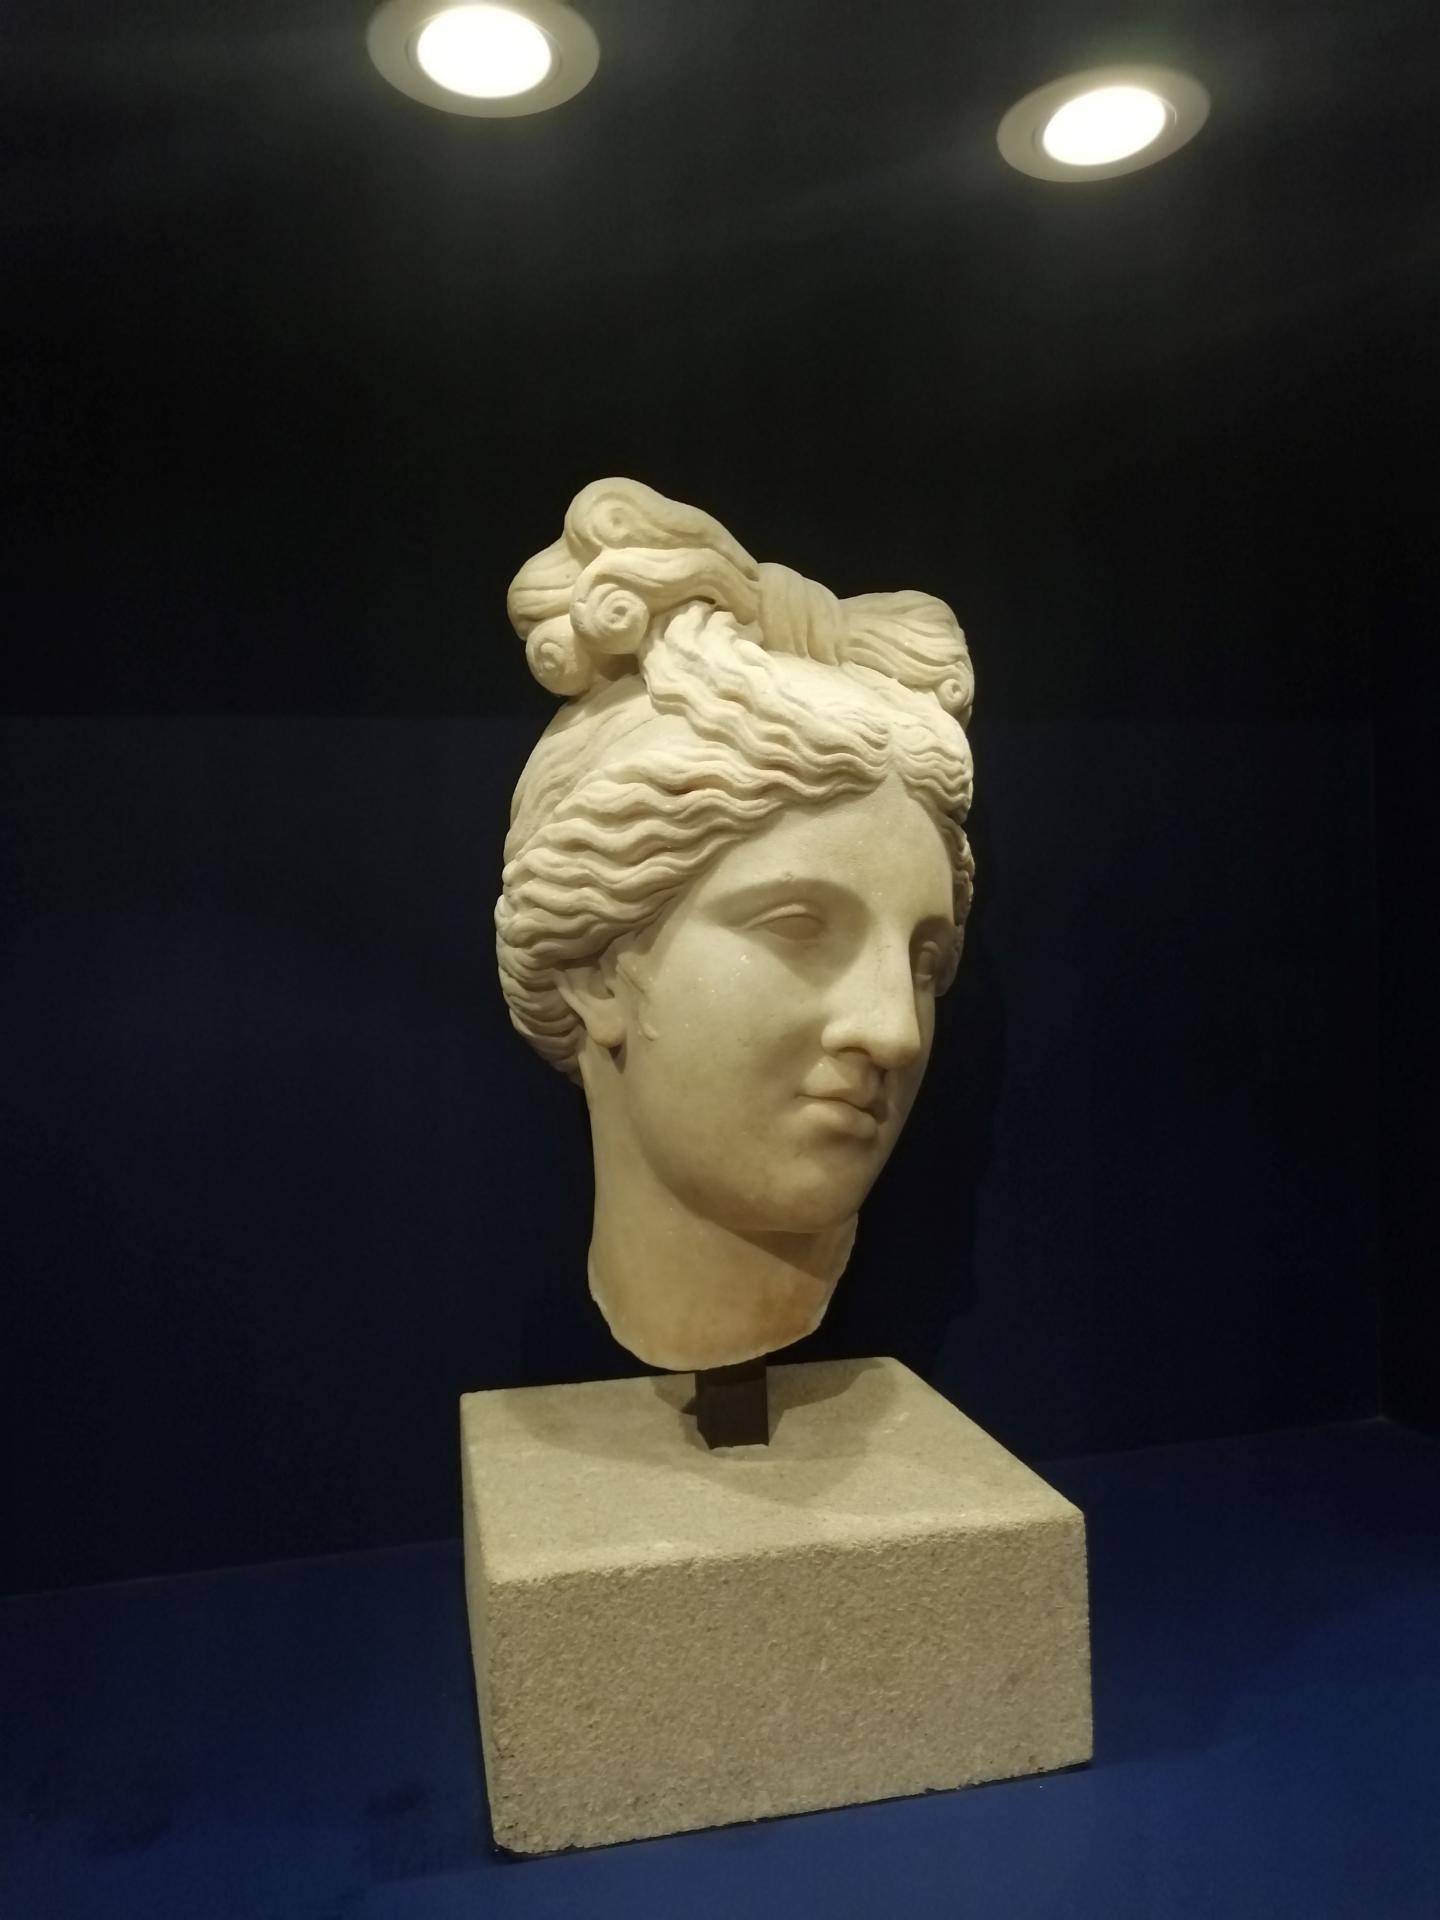 Musee de la romanite 7